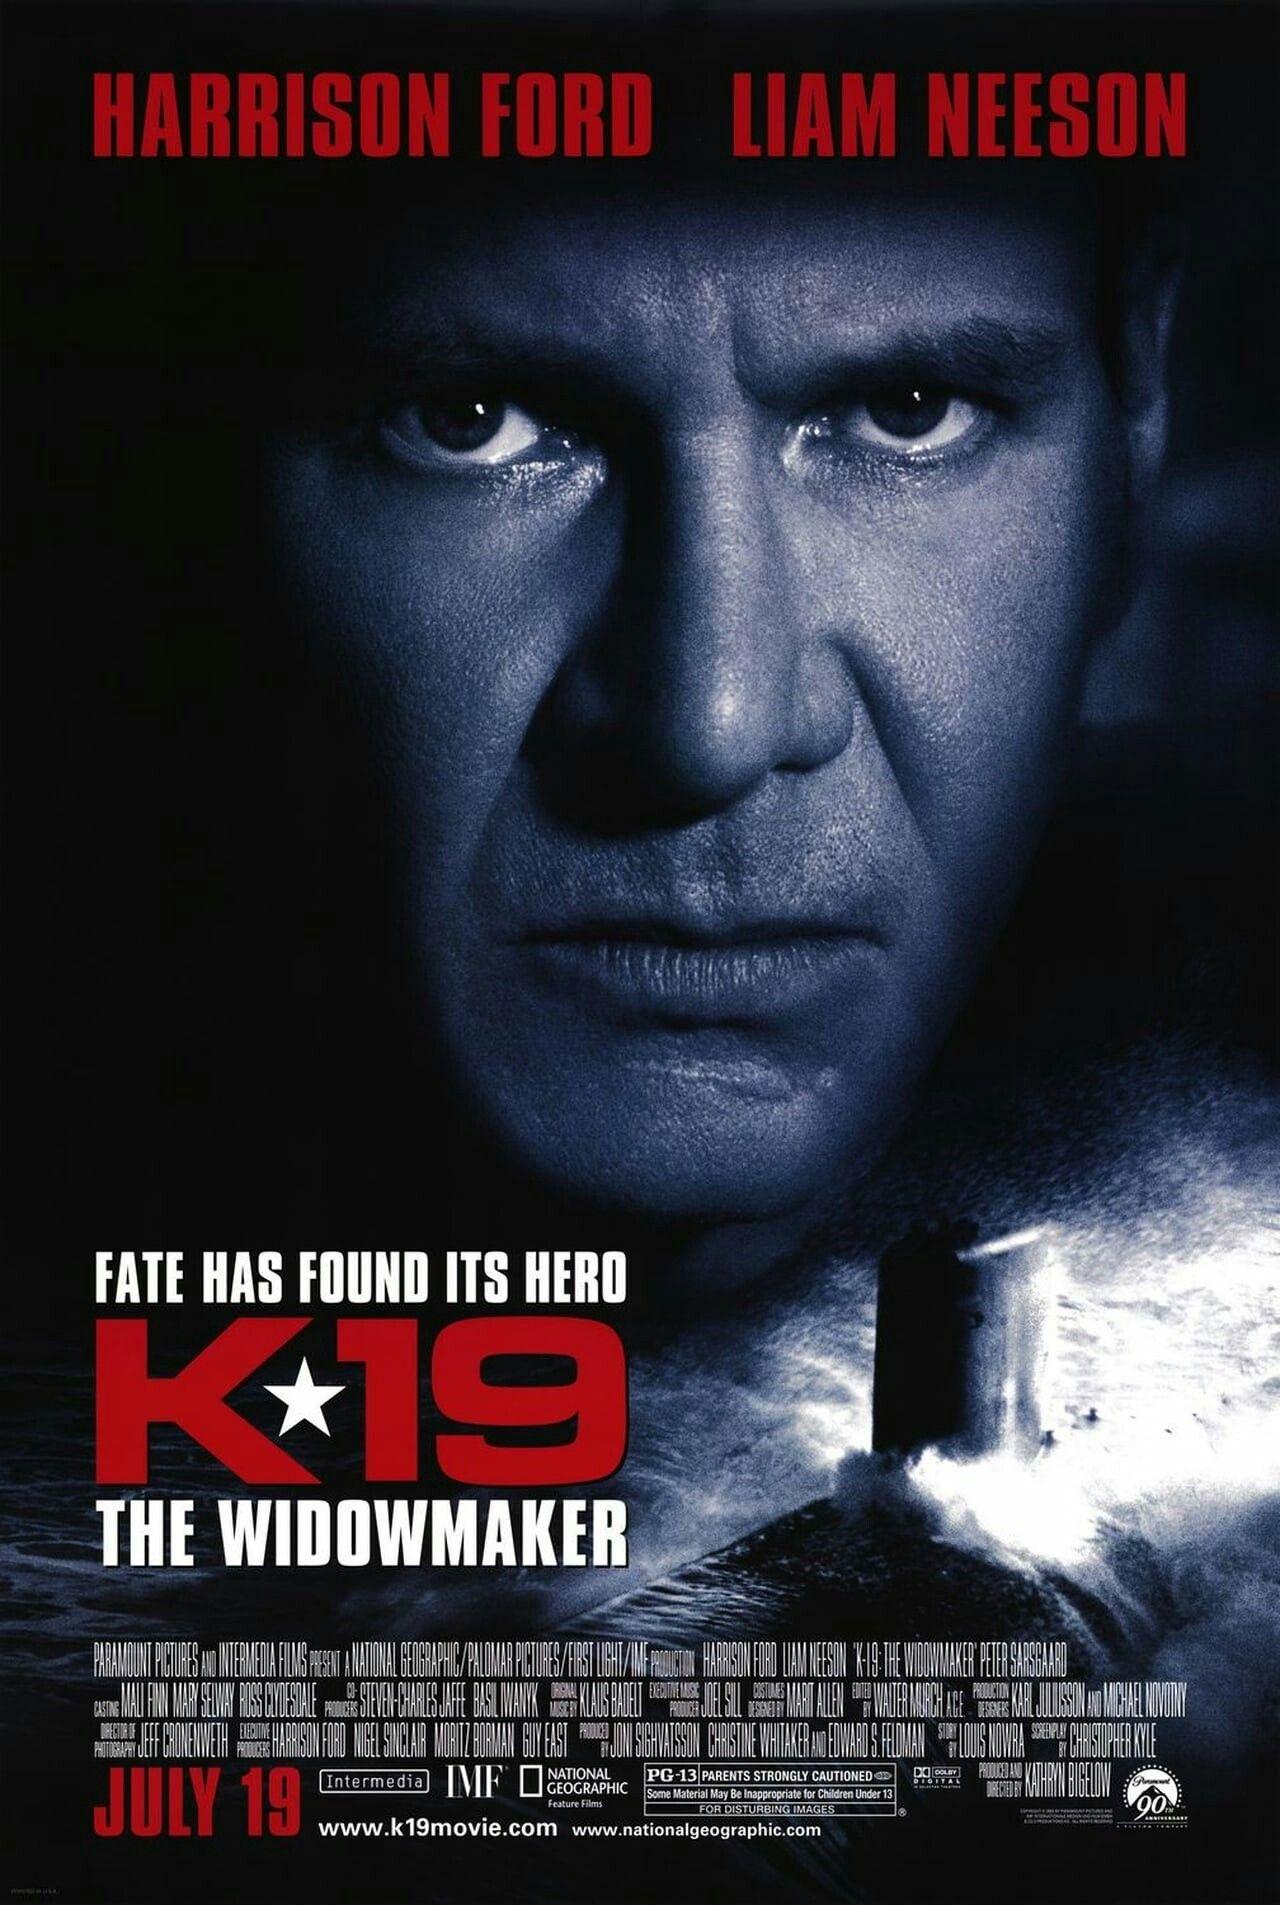 K 19 The Widowmaker 2002 Peliculas Belicas Peliculas Cine Portadas De Peliculas